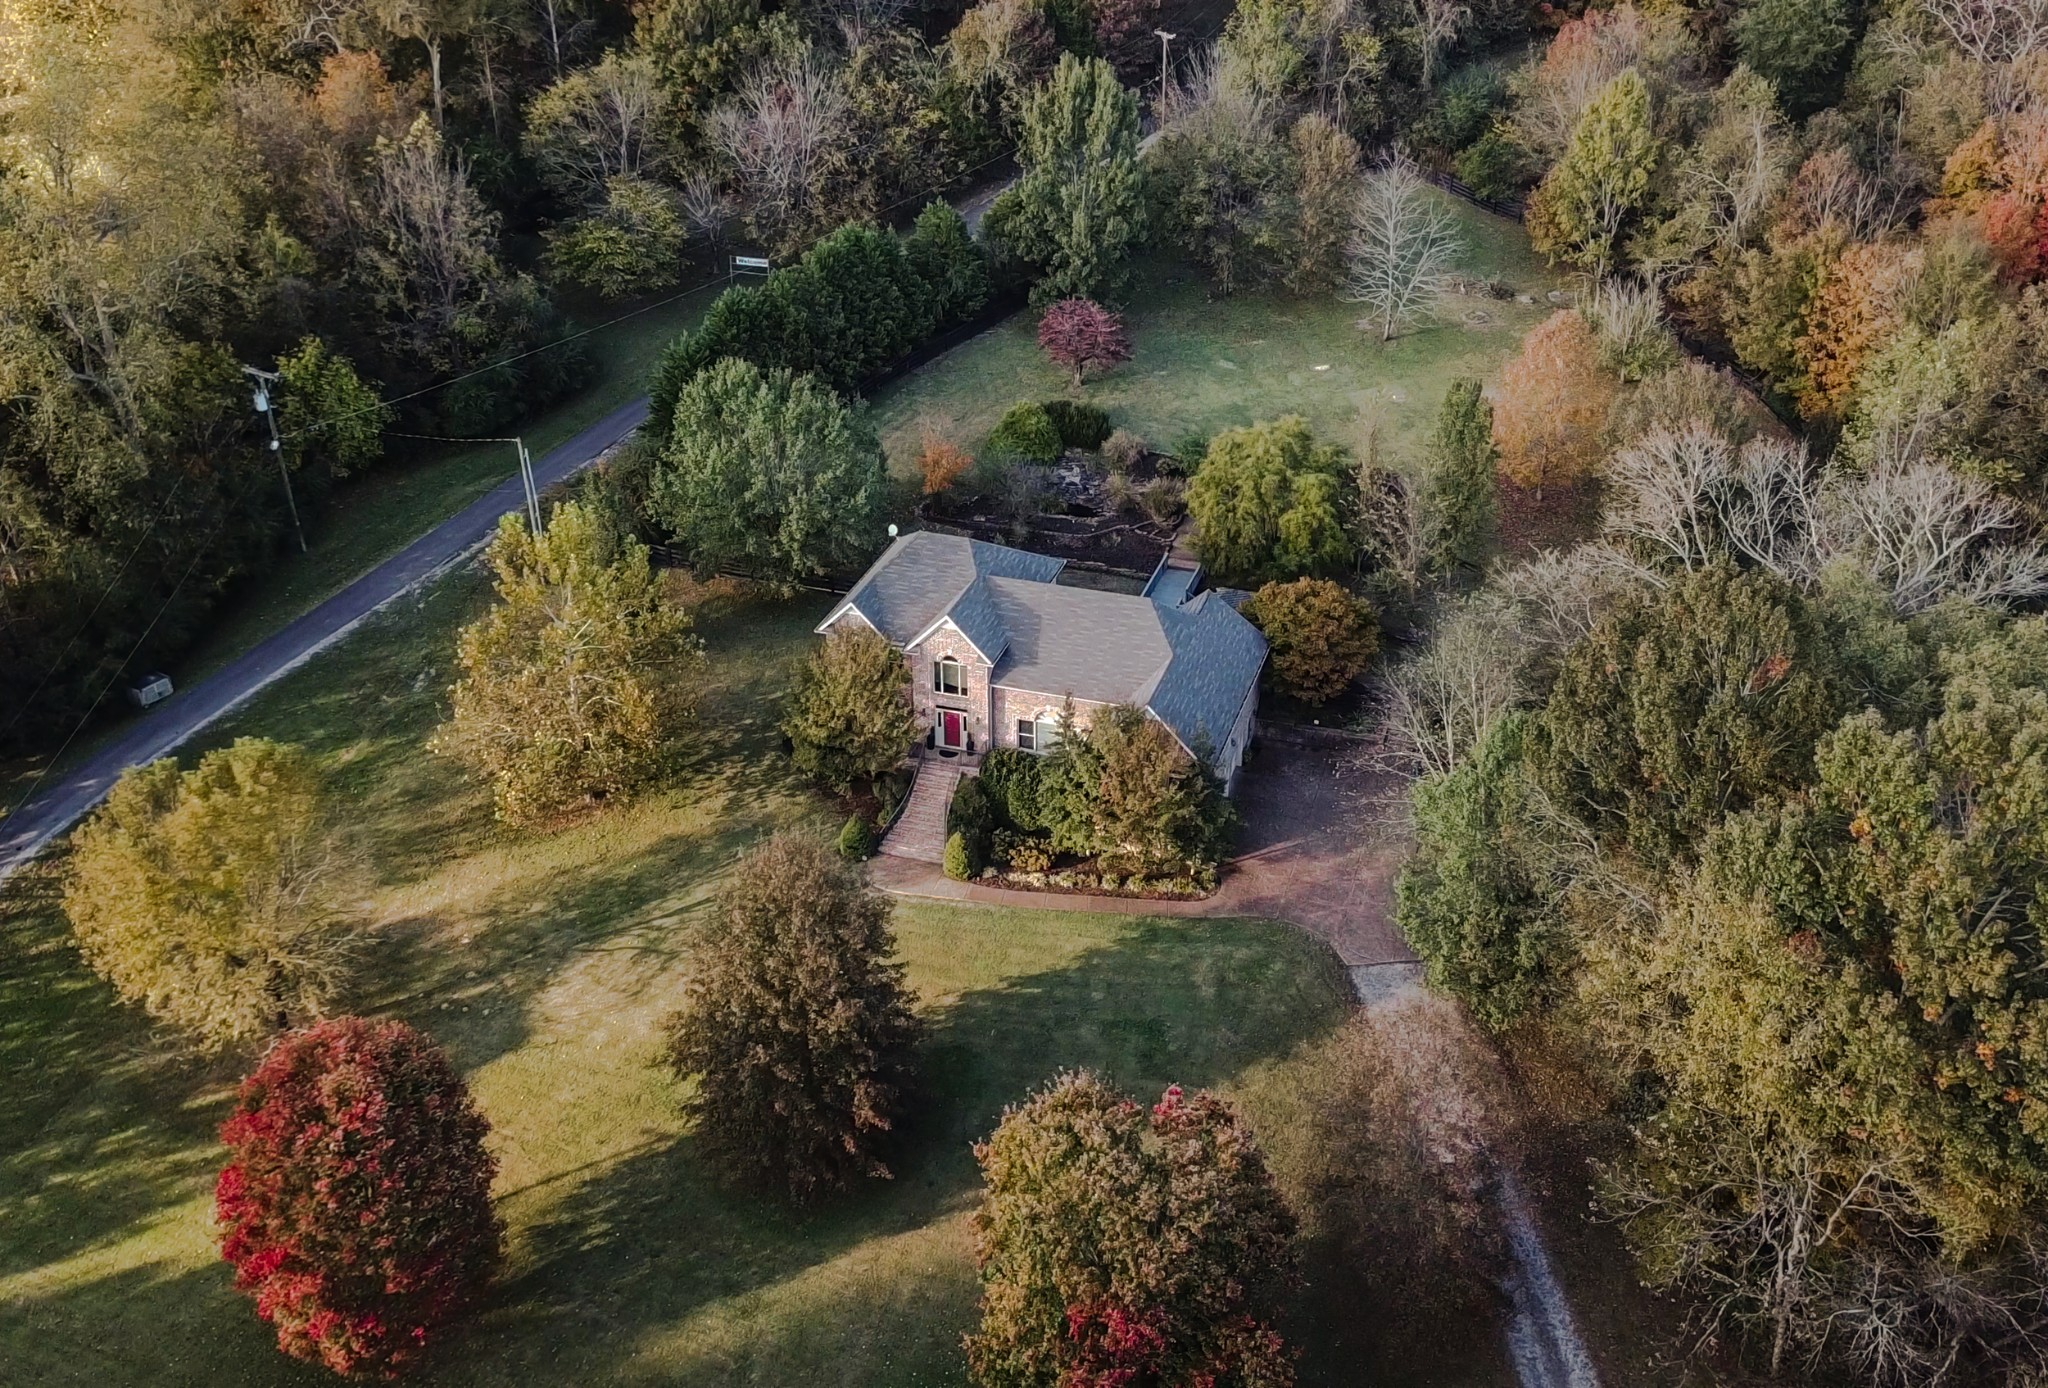 6116 Lickton Pike, Goodlettsville, TN 37072 - Goodlettsville, TN real estate listing